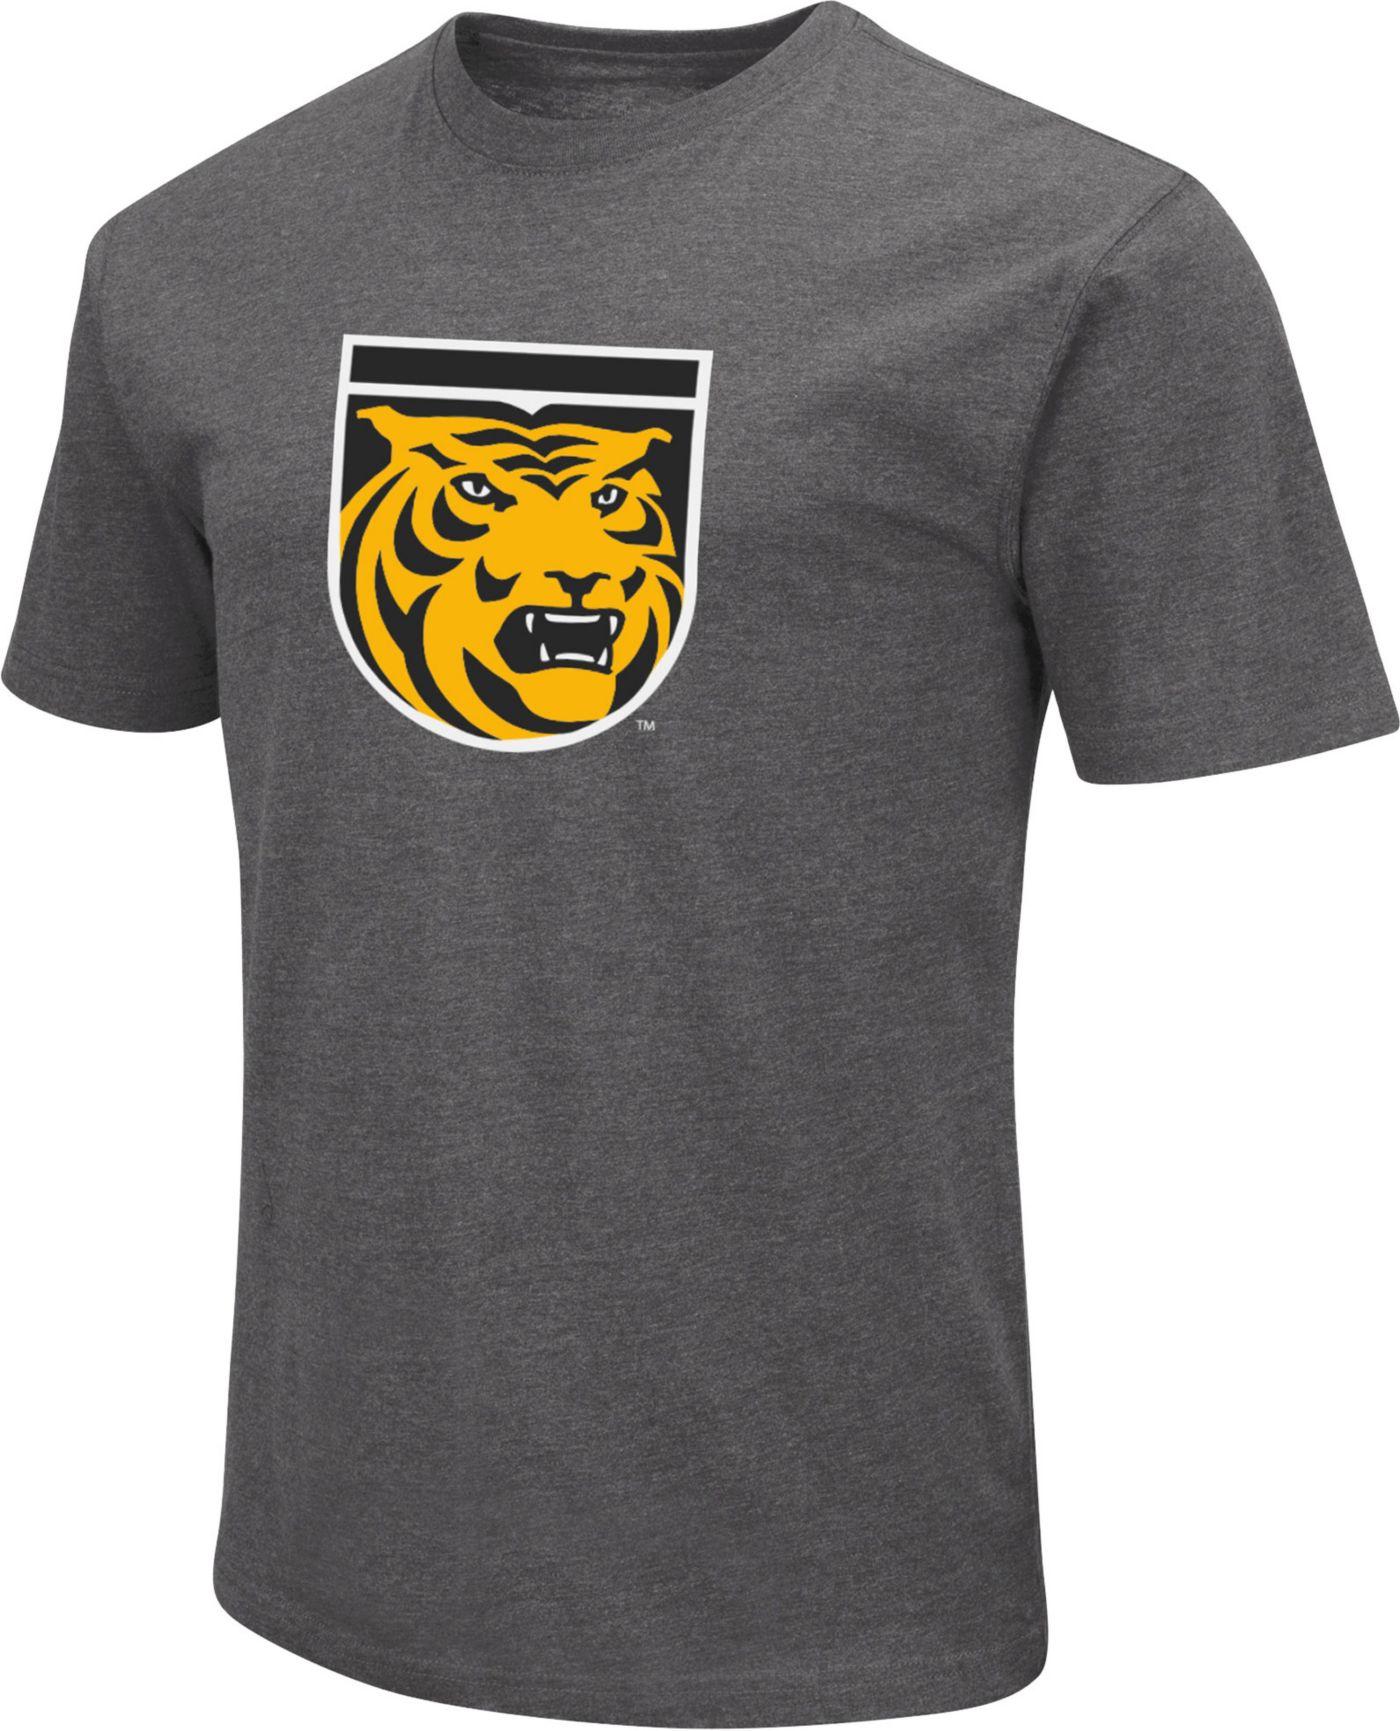 Colosseum Men's Colorado College Tigers Grey Dual Blend T-Shirt